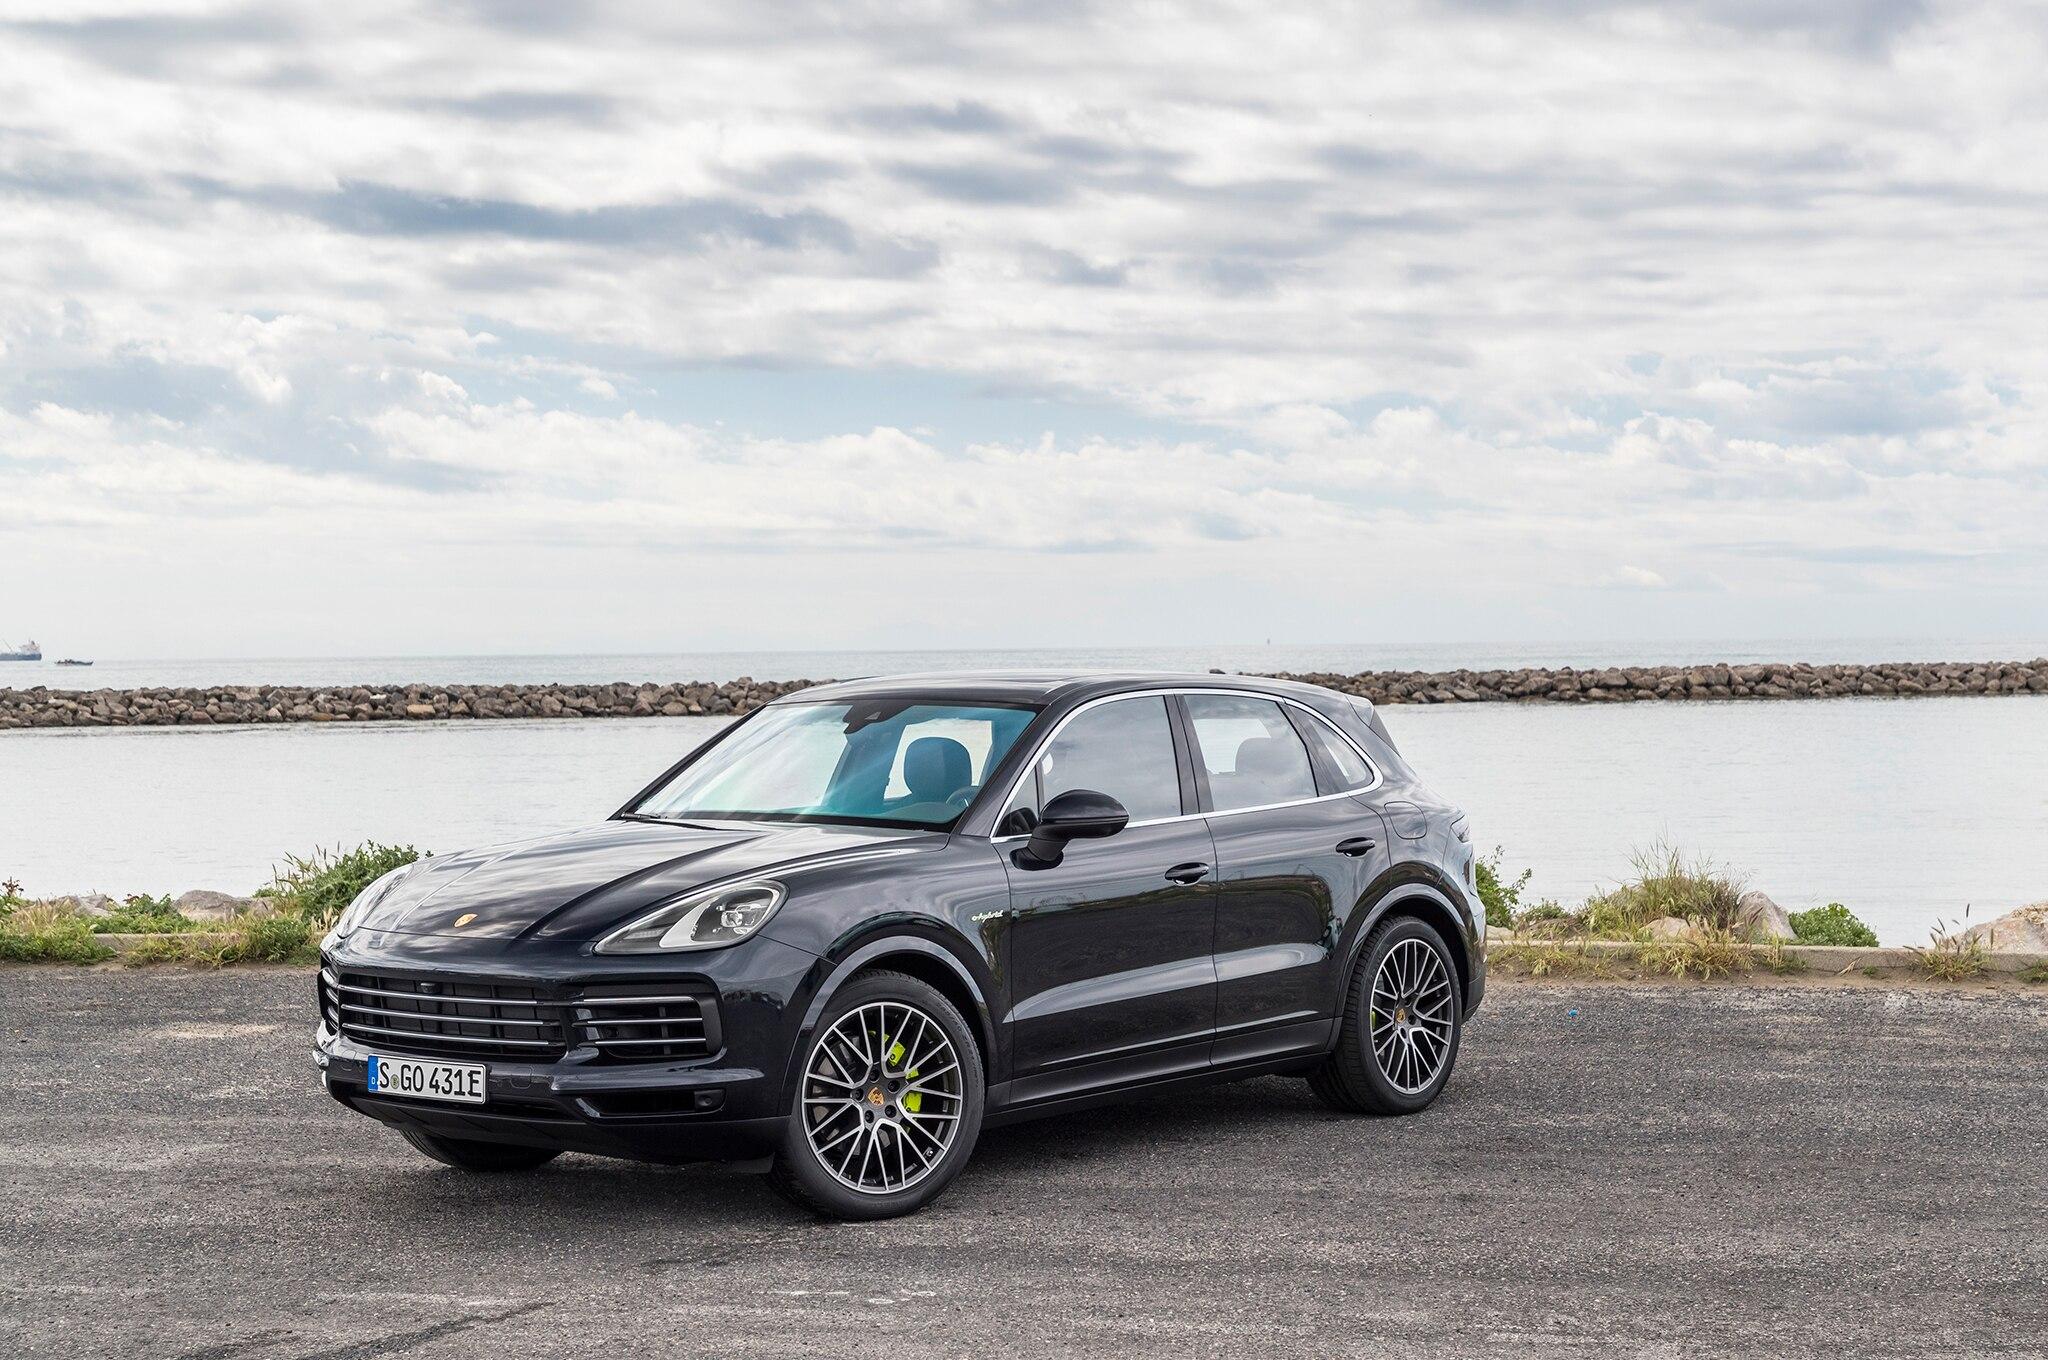 2019 porsche cayenne e hybrid first drive review automobile magazine. Black Bedroom Furniture Sets. Home Design Ideas